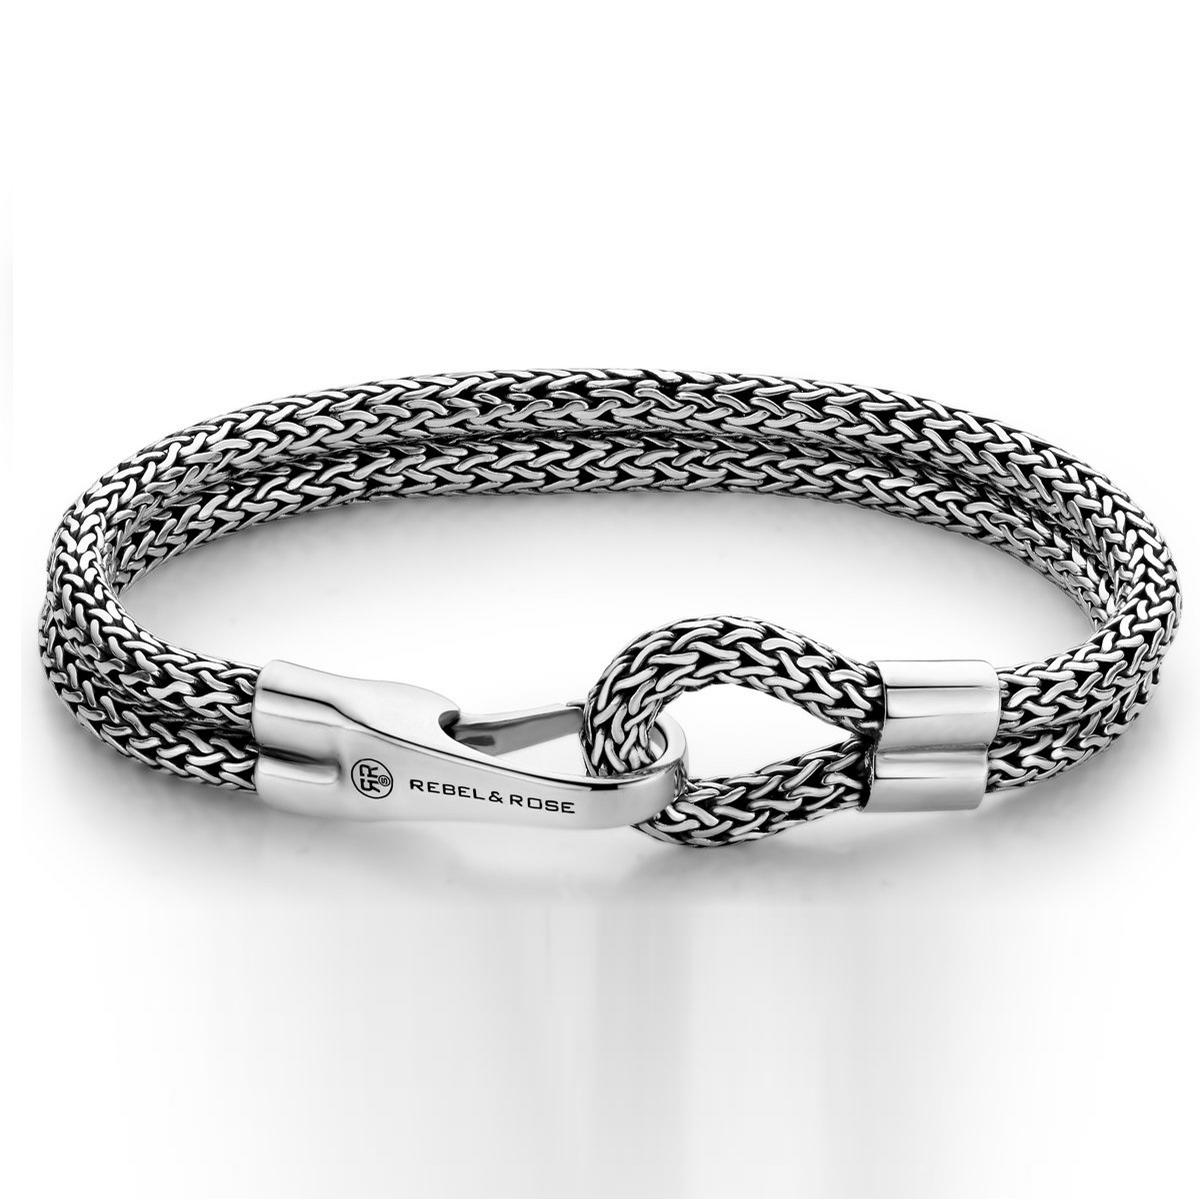 Rebel & Rose Double Hooked Bracelet L